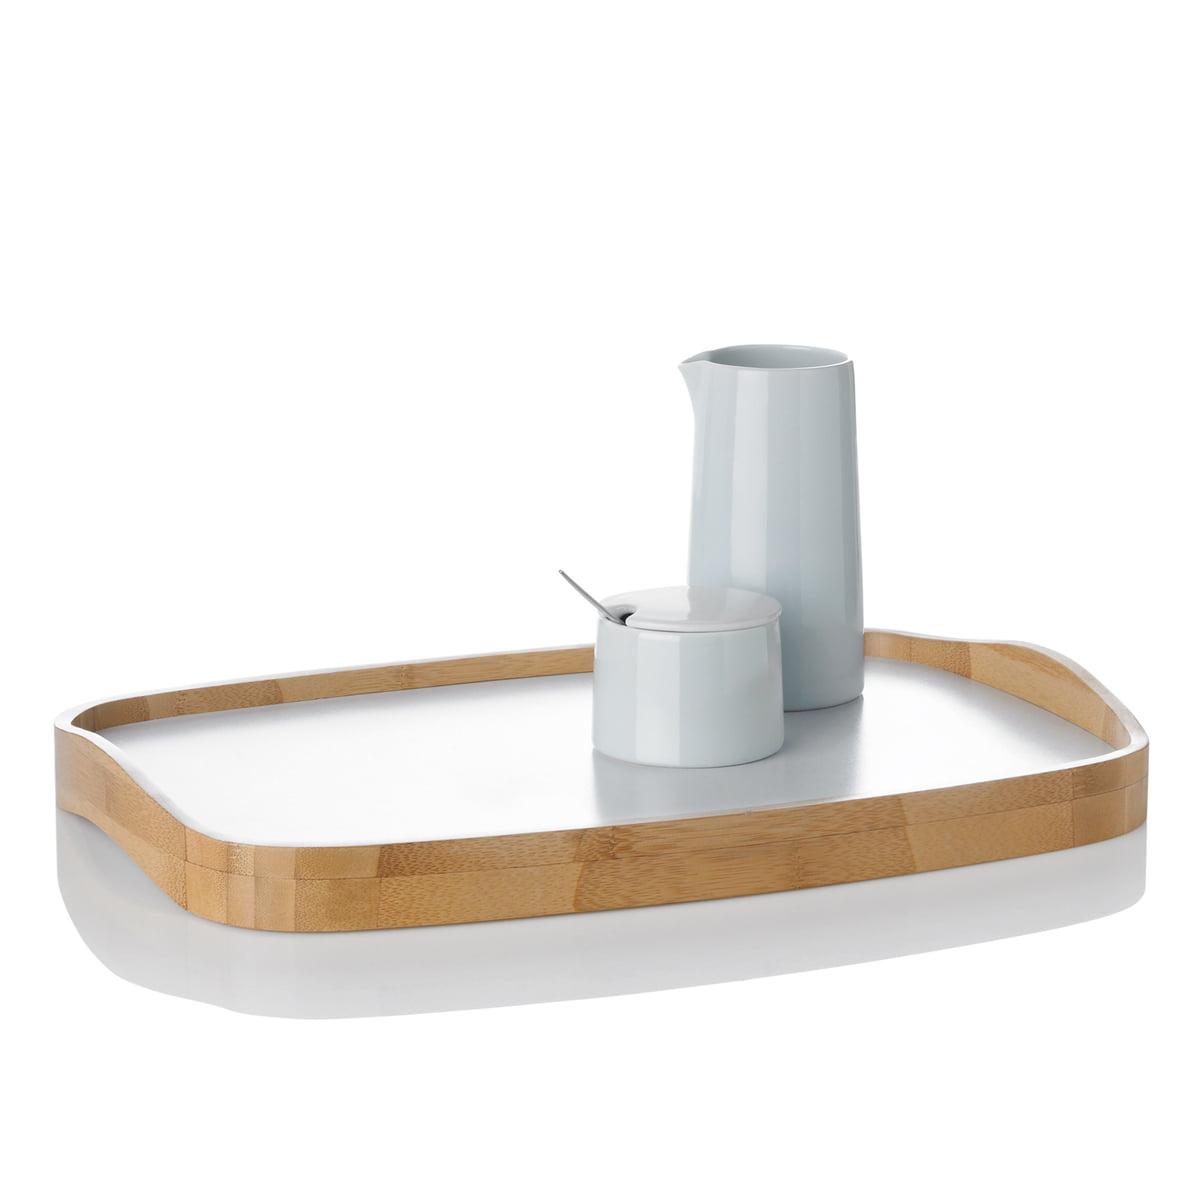 stelton emma serviertablett im design shop. Black Bedroom Furniture Sets. Home Design Ideas